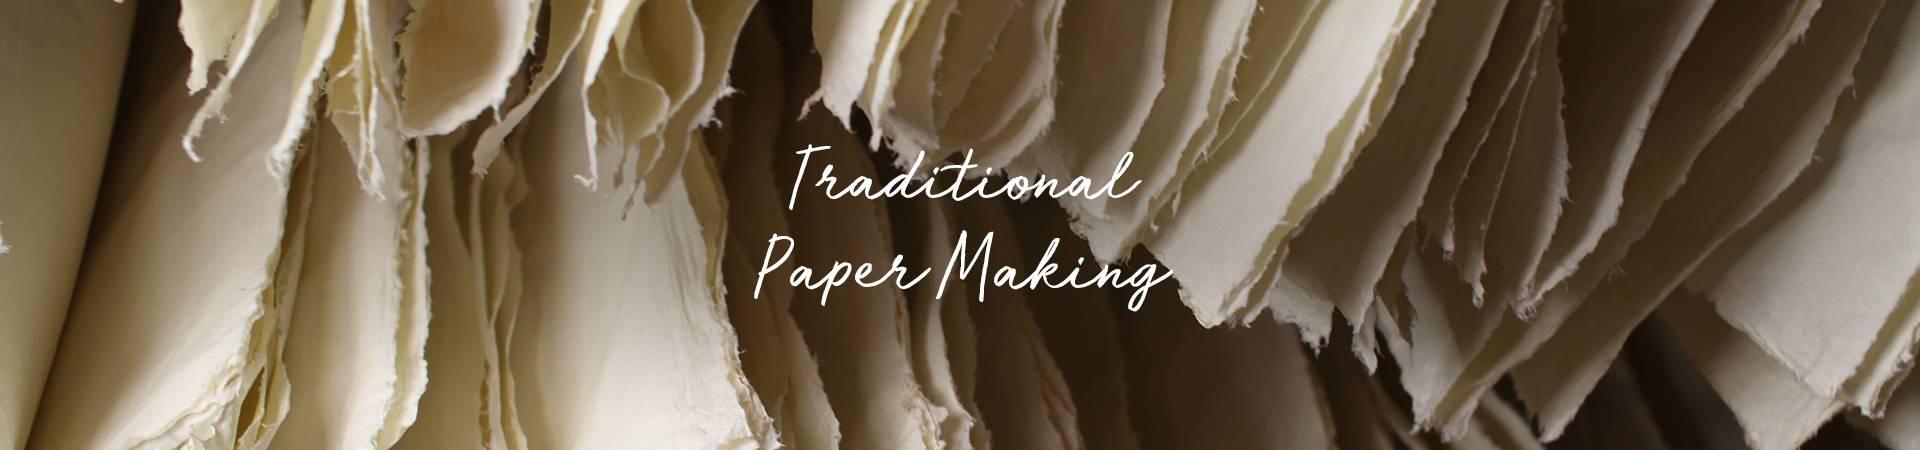 Nkuku_Traditional-Paper-Making_Header_Desktop.jpg